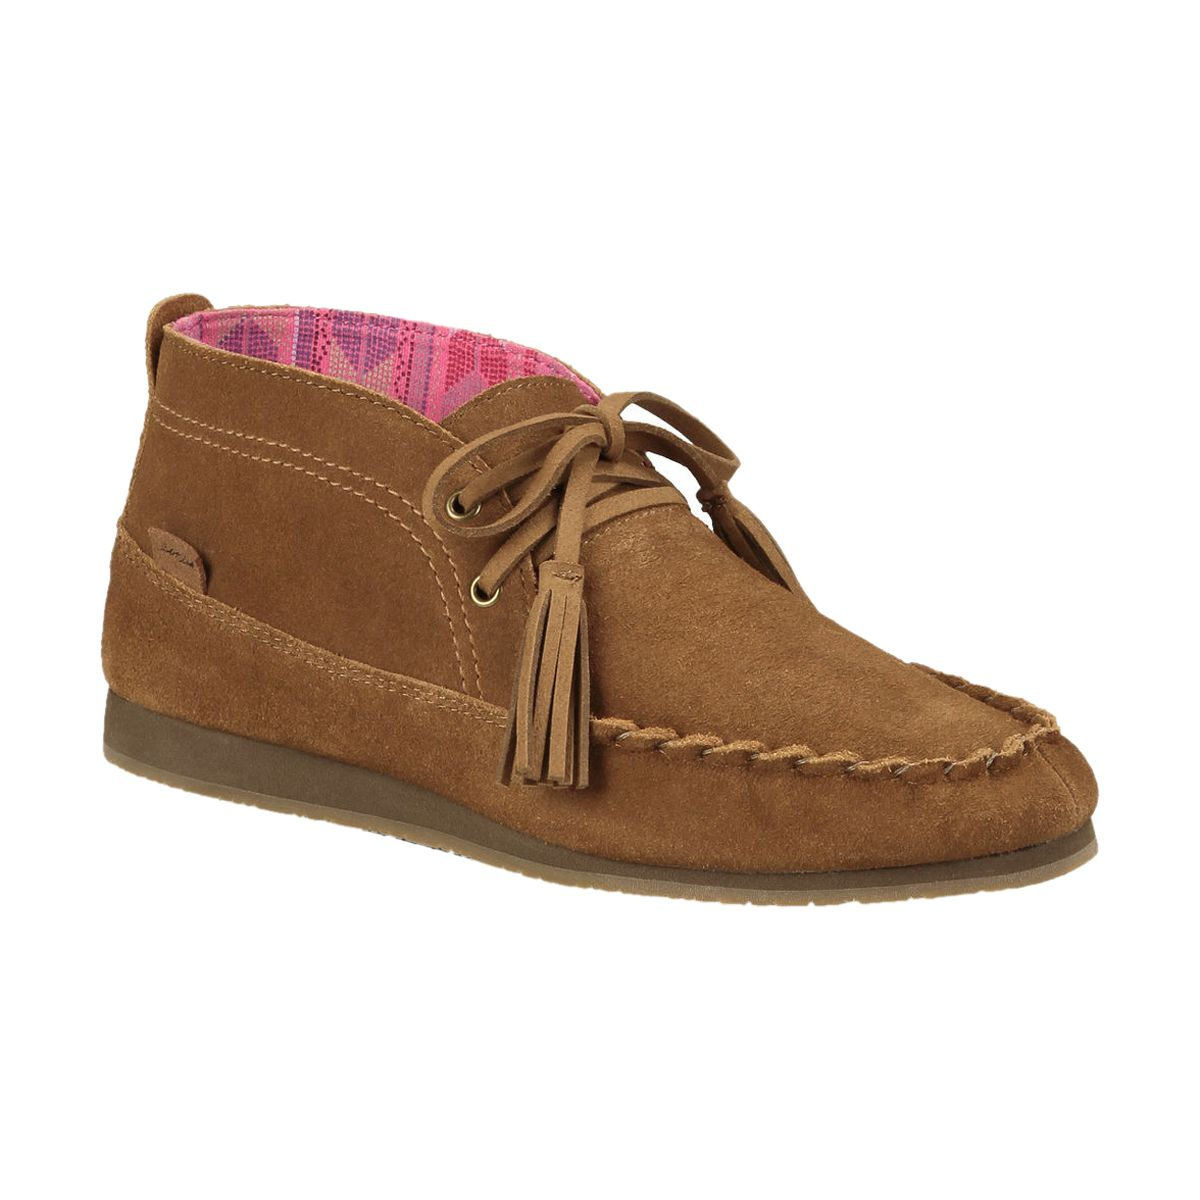 Sanuk Moccodile Shoe - Women's